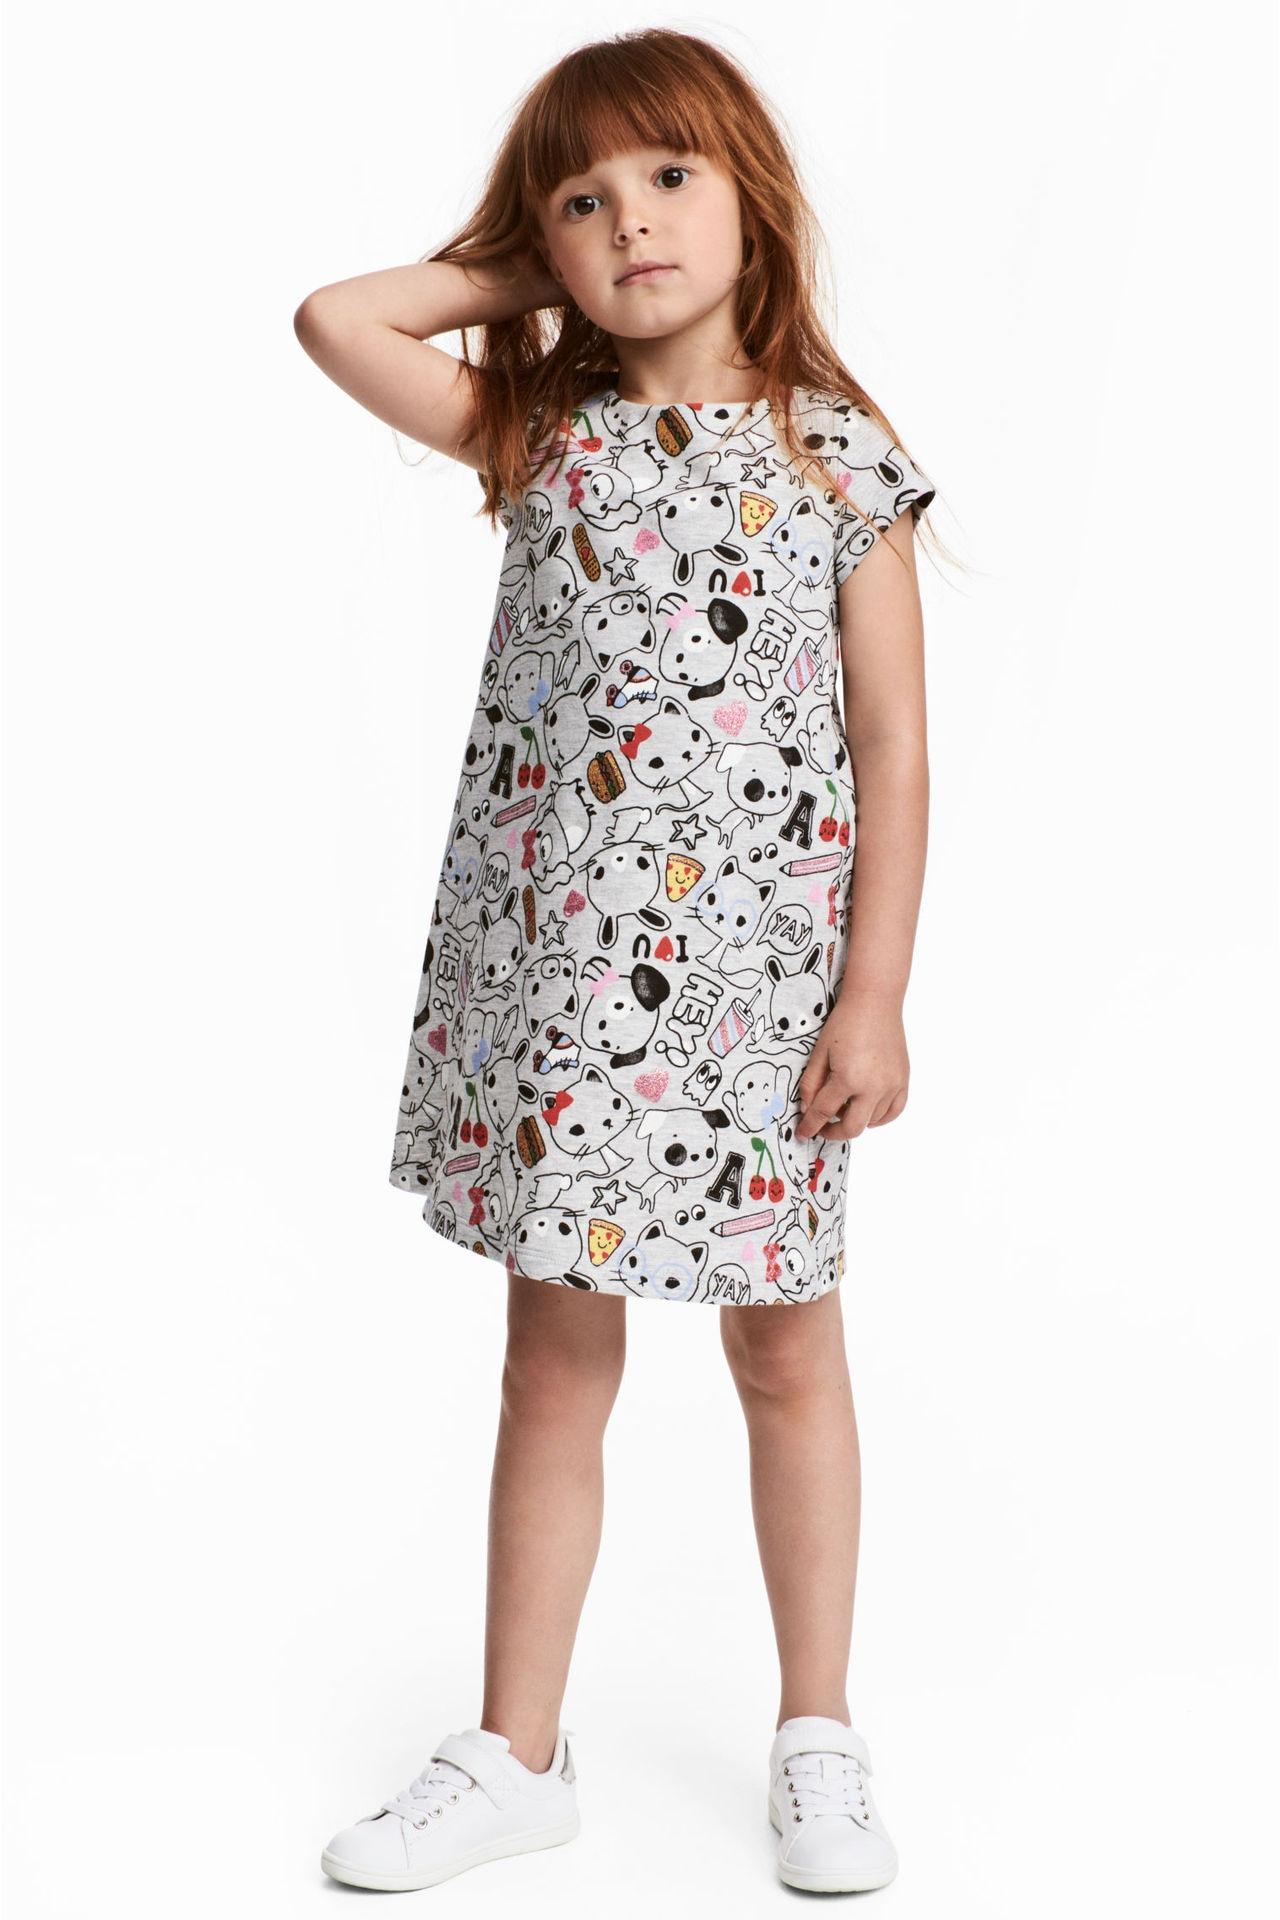 New Toddler Baby Flower Pattern Girls Princess Dress Wedding Party Kids Dress Clode for 2-7 Years Old Girls